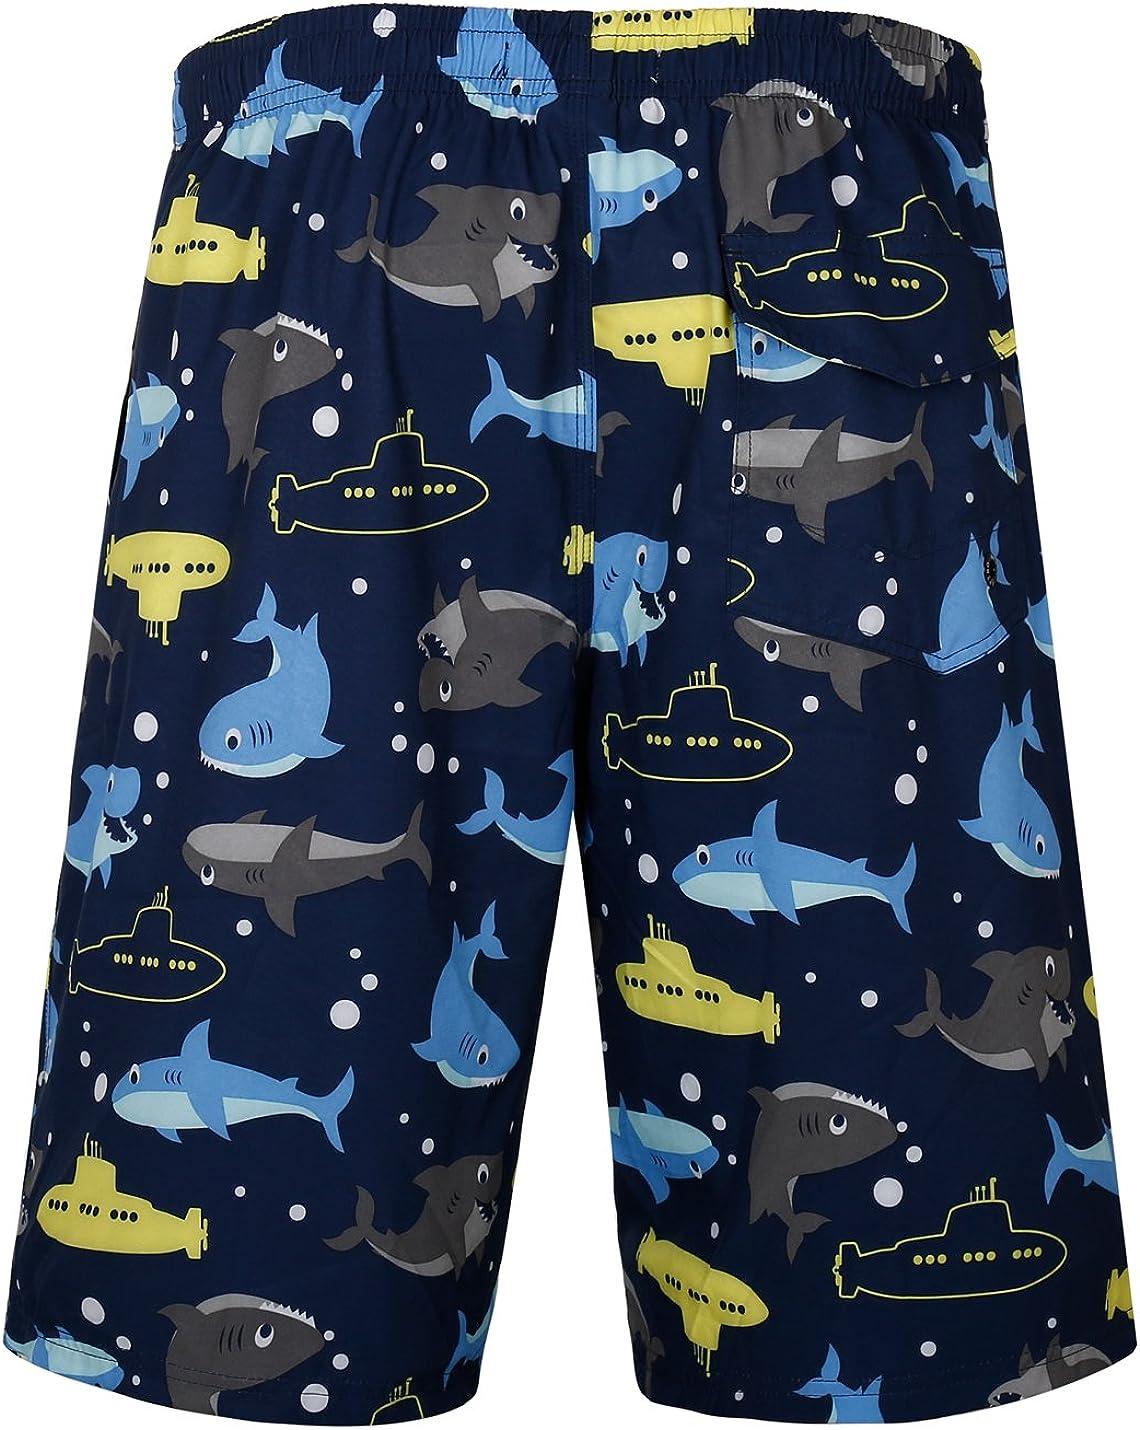 APTRO Mens Swim Trunks Quick Dry Bathing Suit Swim Shorts